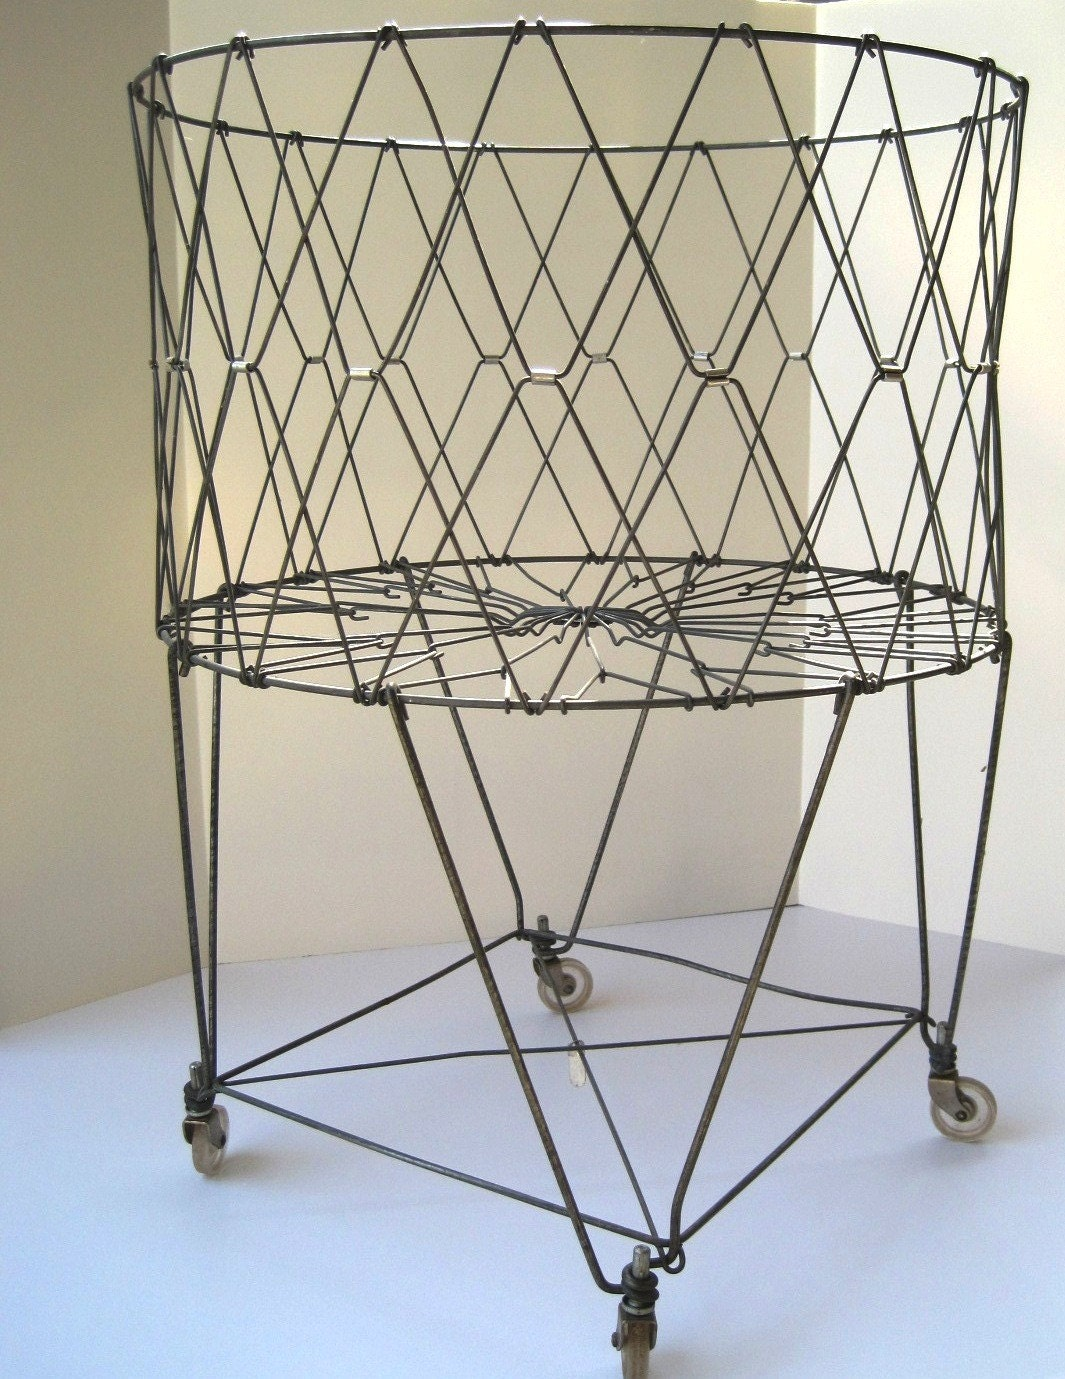 Vintage Laundry Metal Folding Basket On Wheels